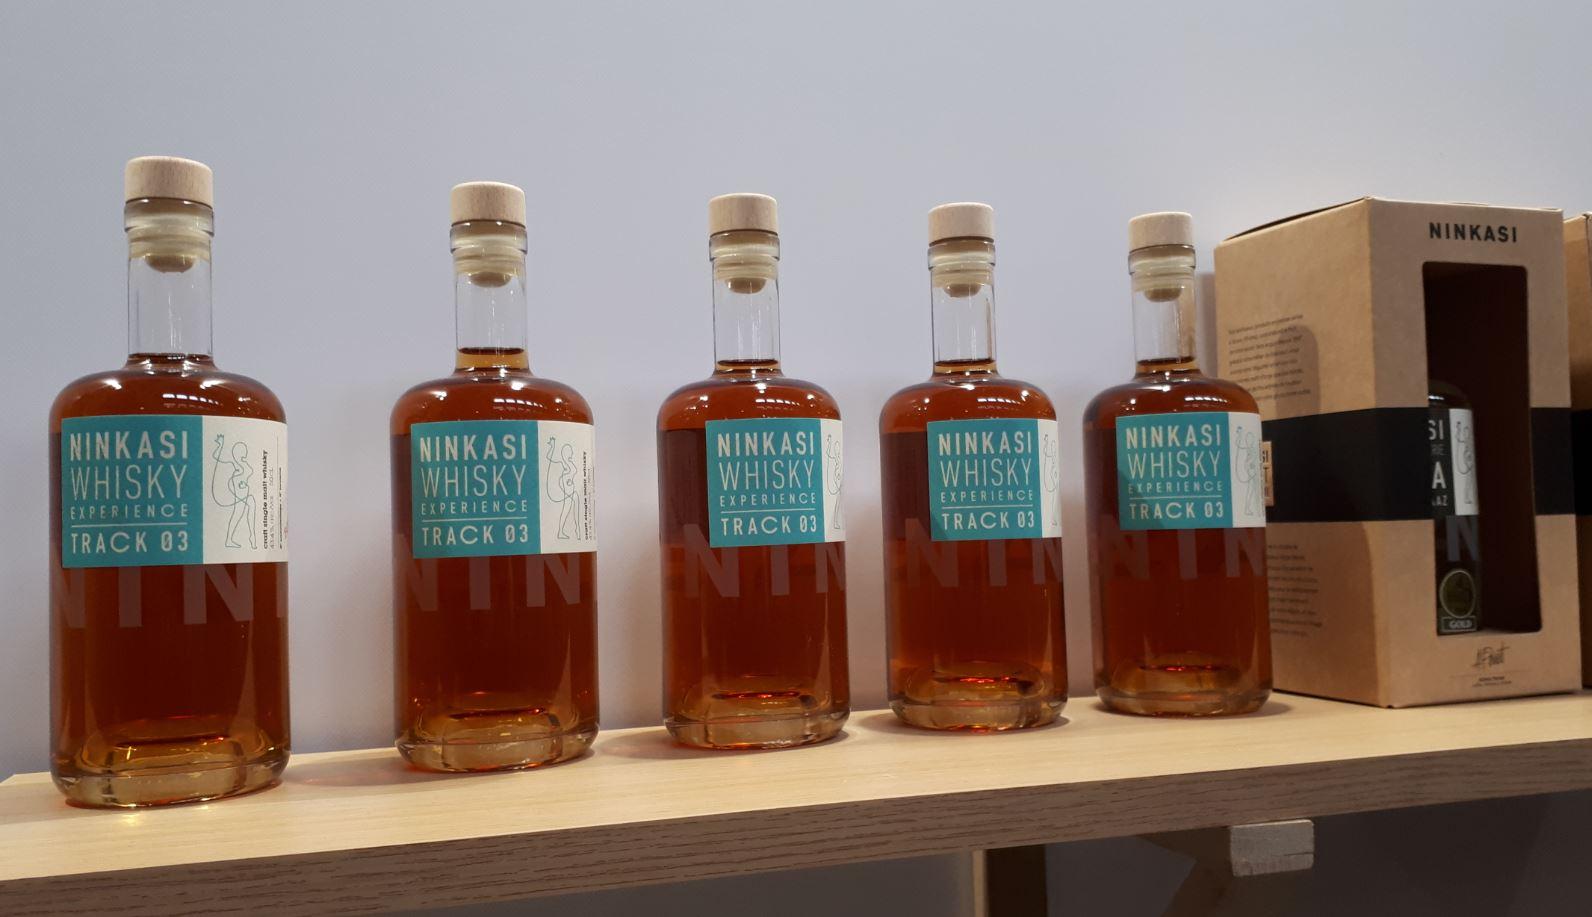 Ninkasi Whisky Experience Track 03